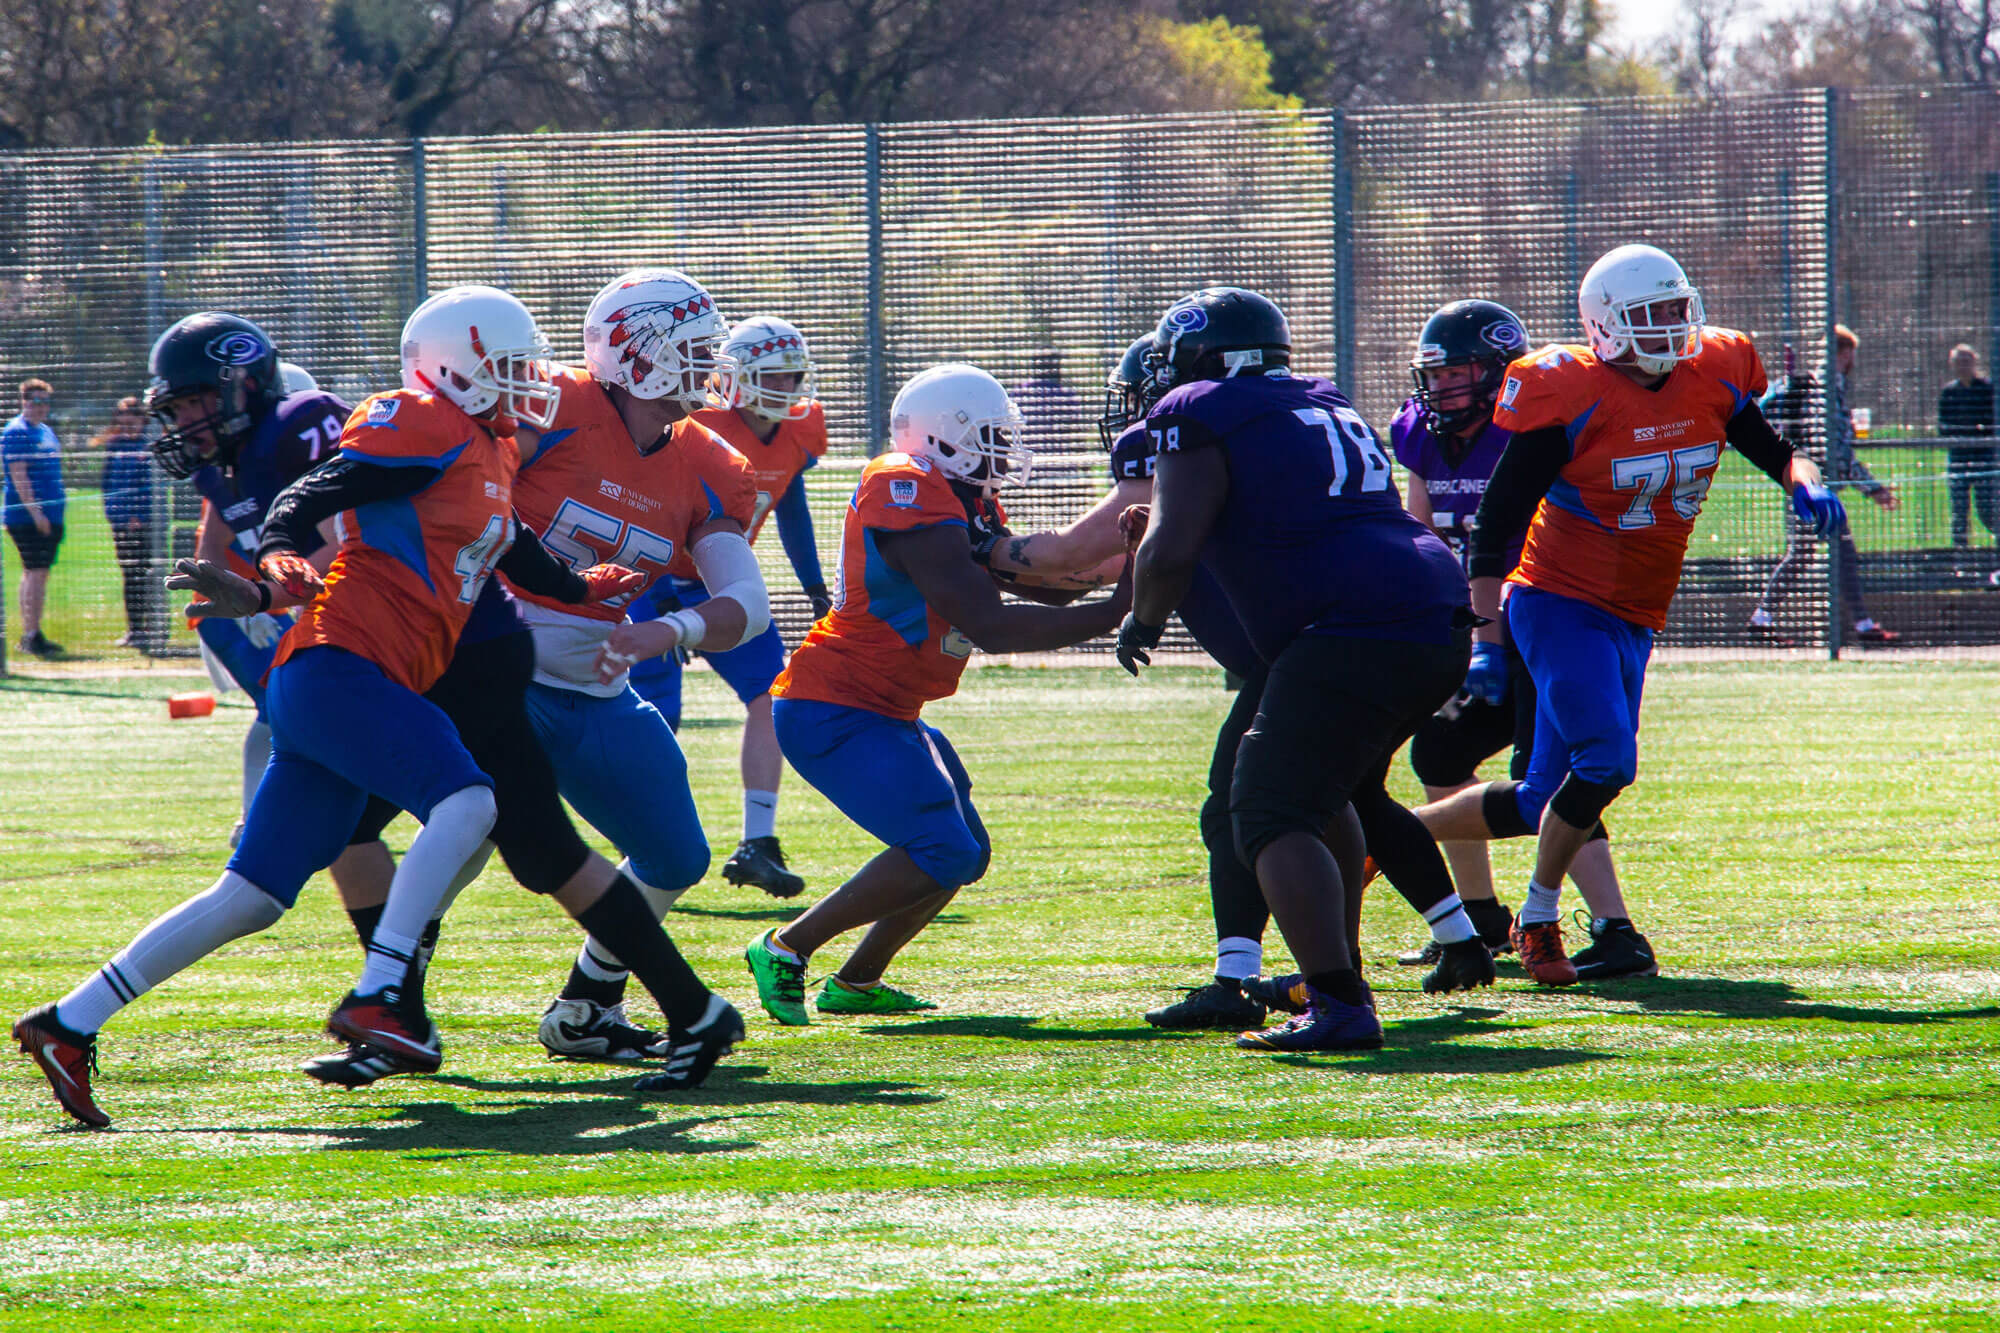 Team Derby playing American football